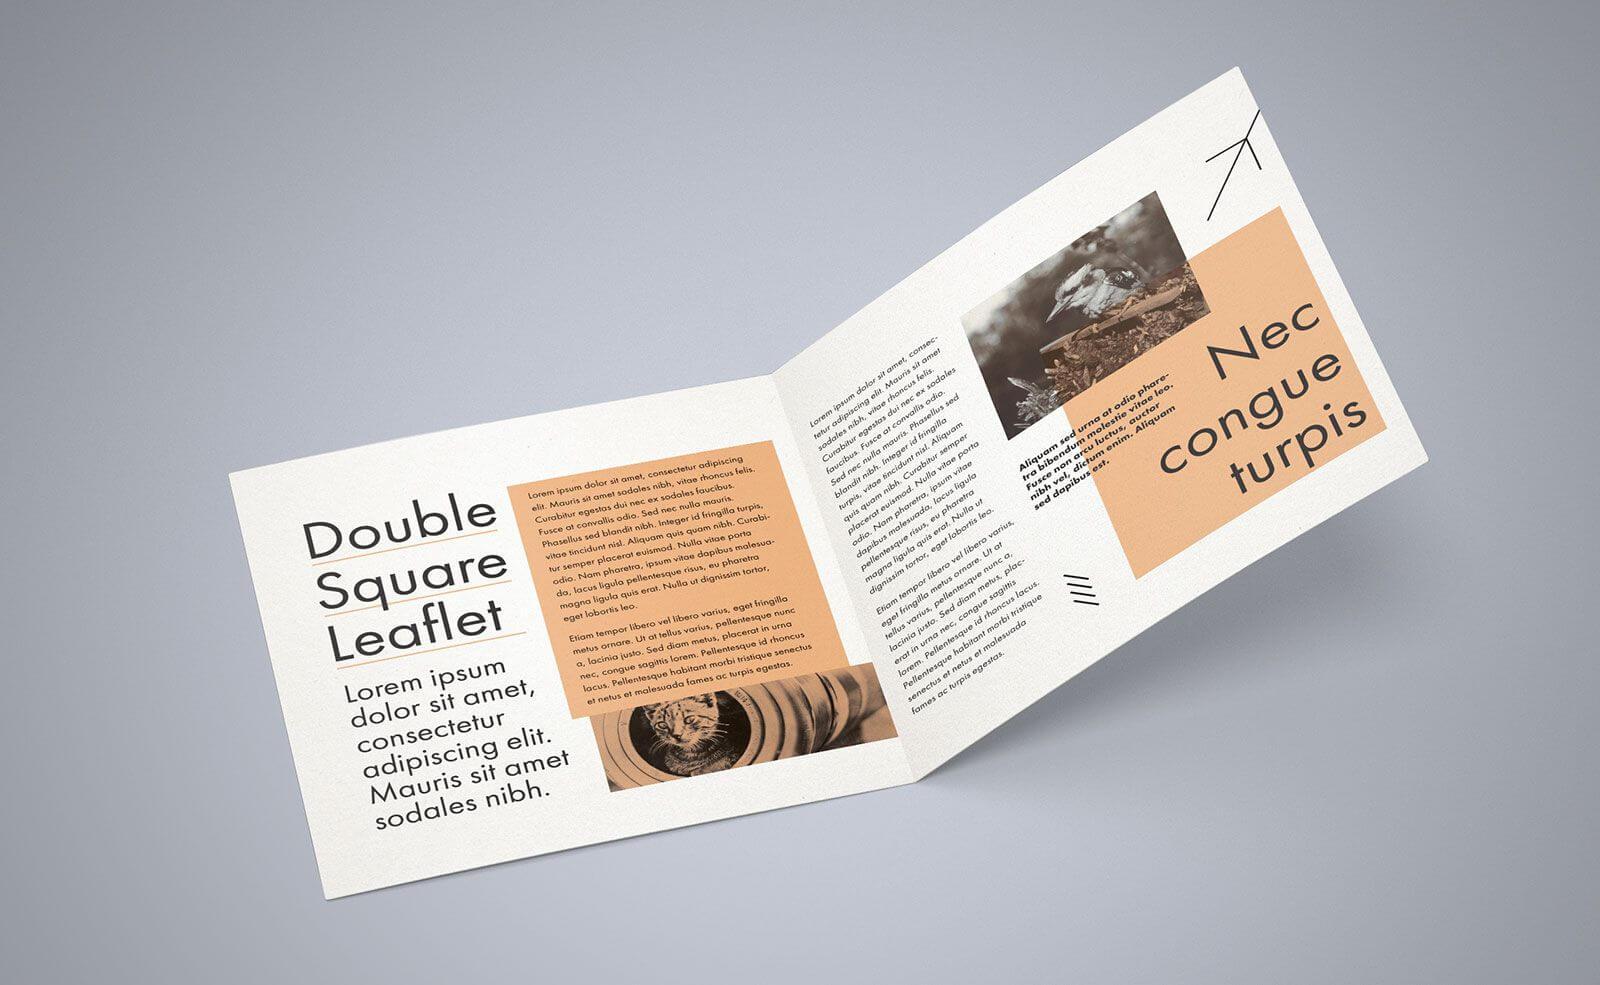 Free Square Bi Fold Brochure Mockup Psd File 2 | Bi Fold With Regard To 2 Fold Brochure Template Psd